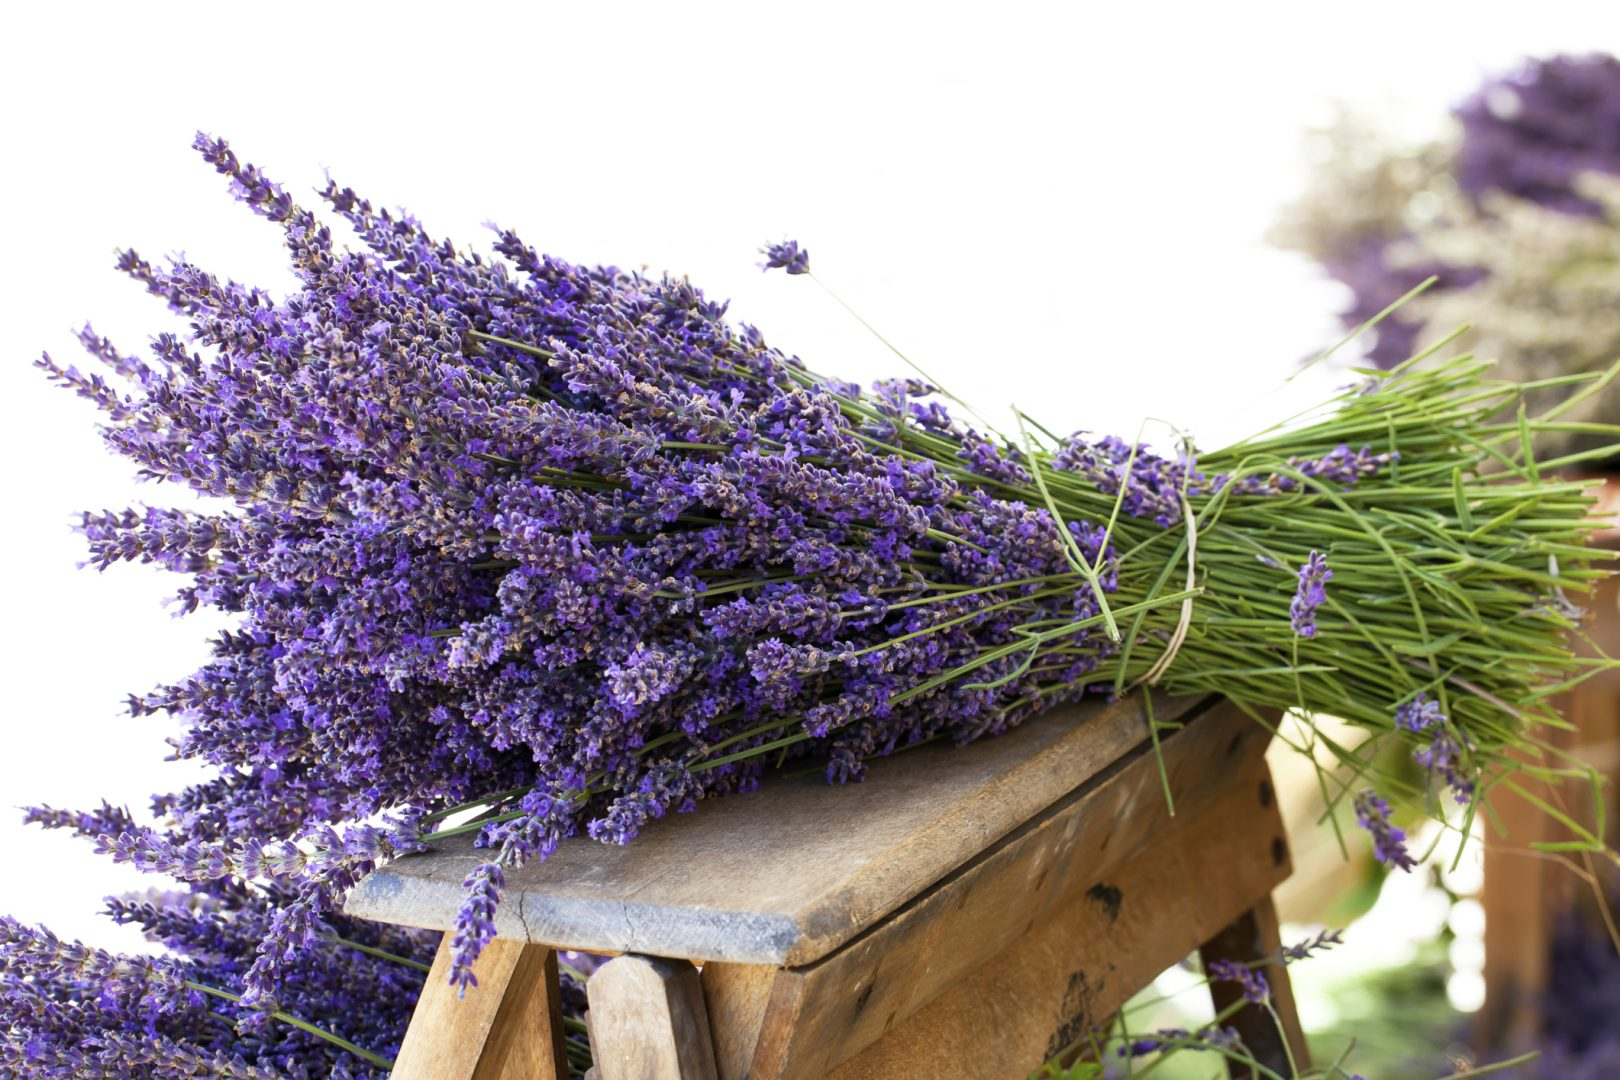 Como plantar e cultivar a apaixonante lavanda blog plantei - Cuidados planta lavanda ...